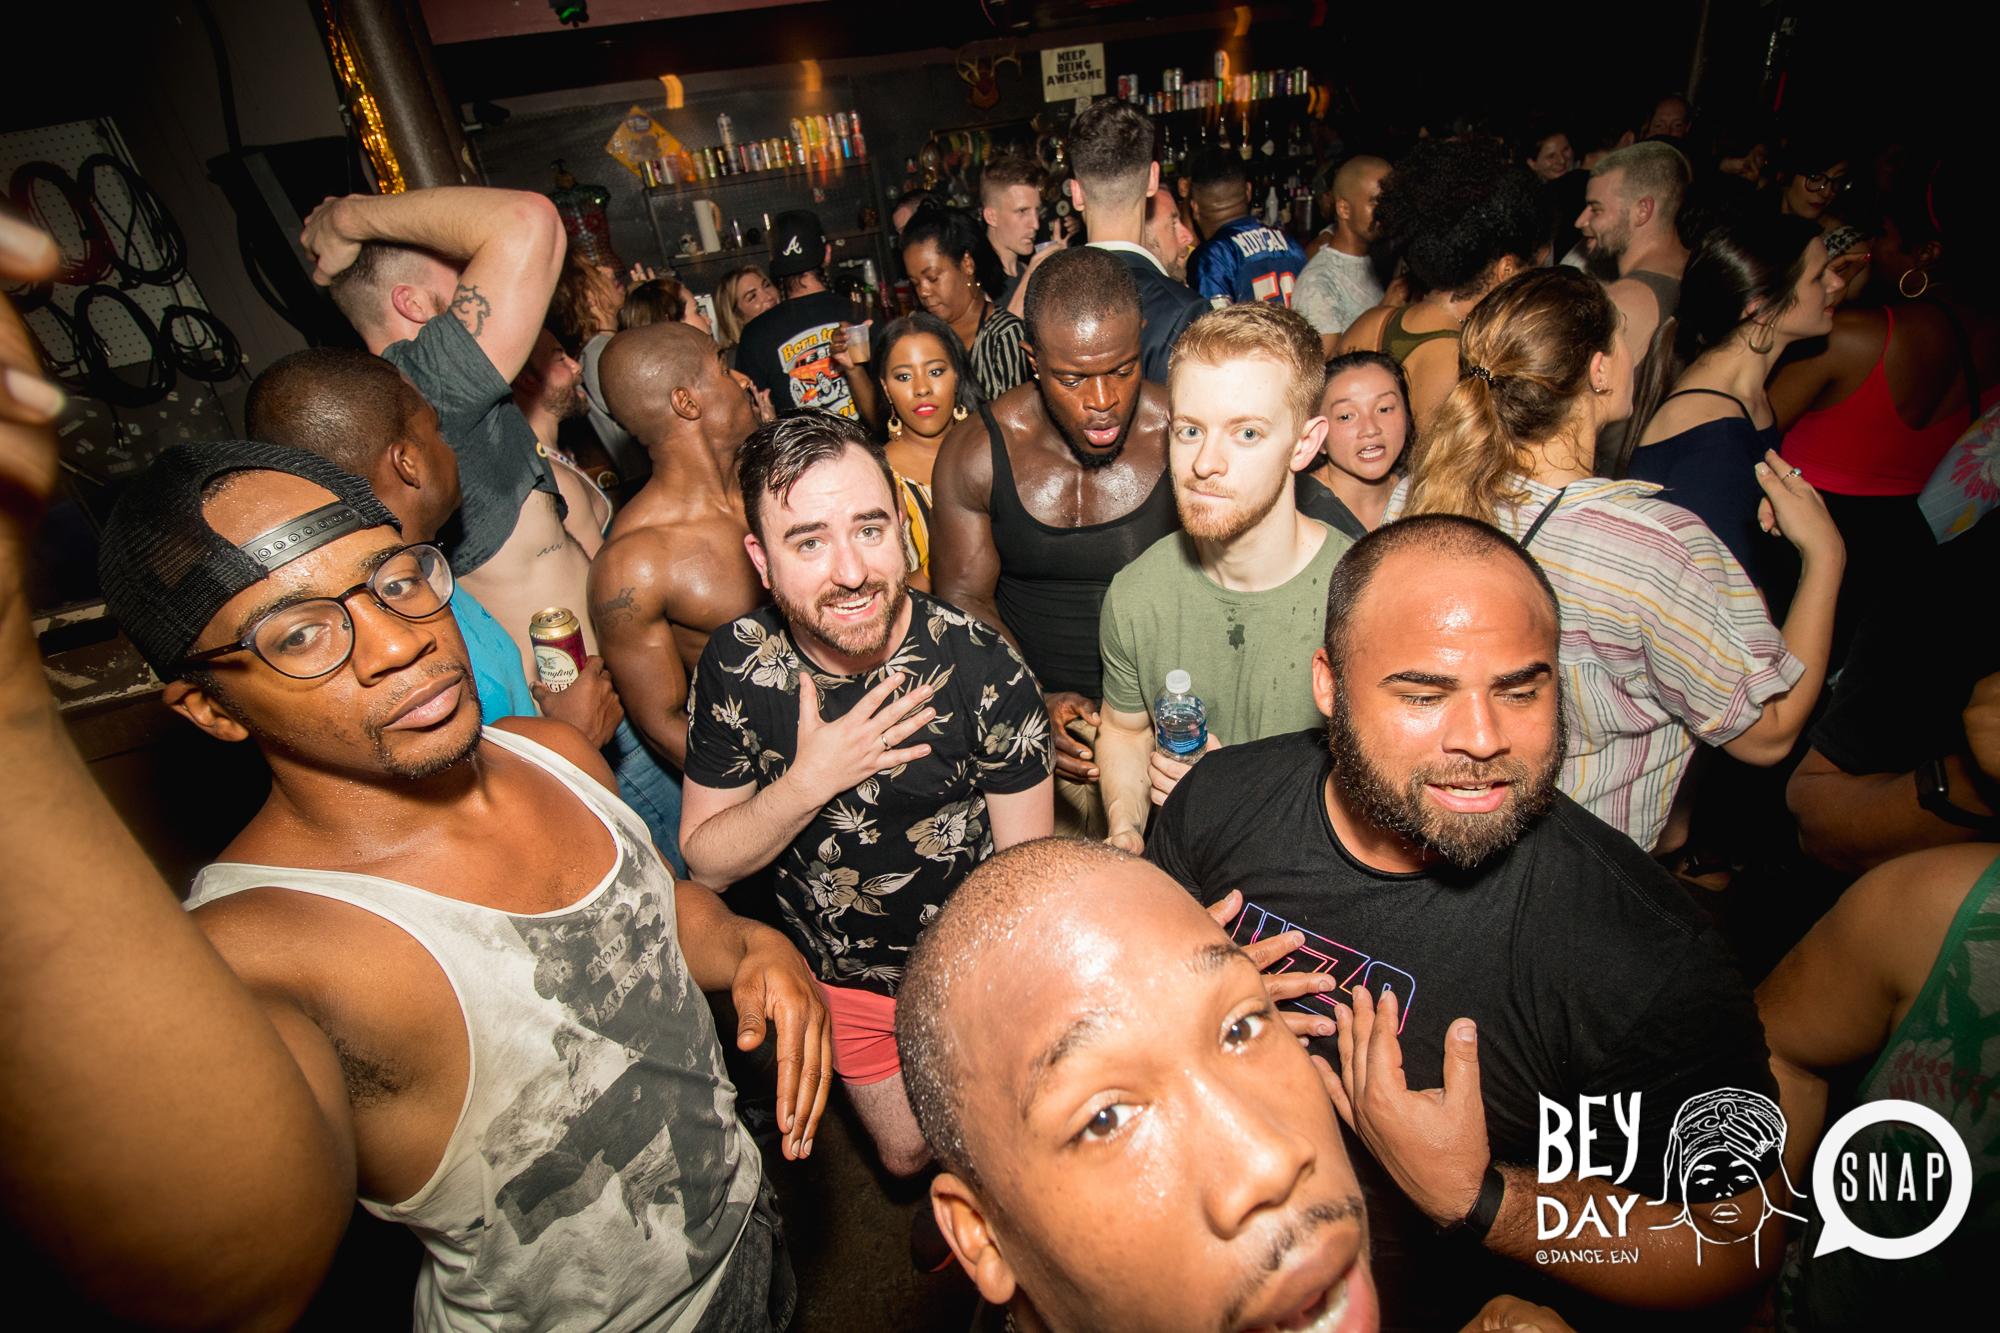 93Bey Day Grace Kelly The Basement Atlanta Oh Snap Kid.jpg